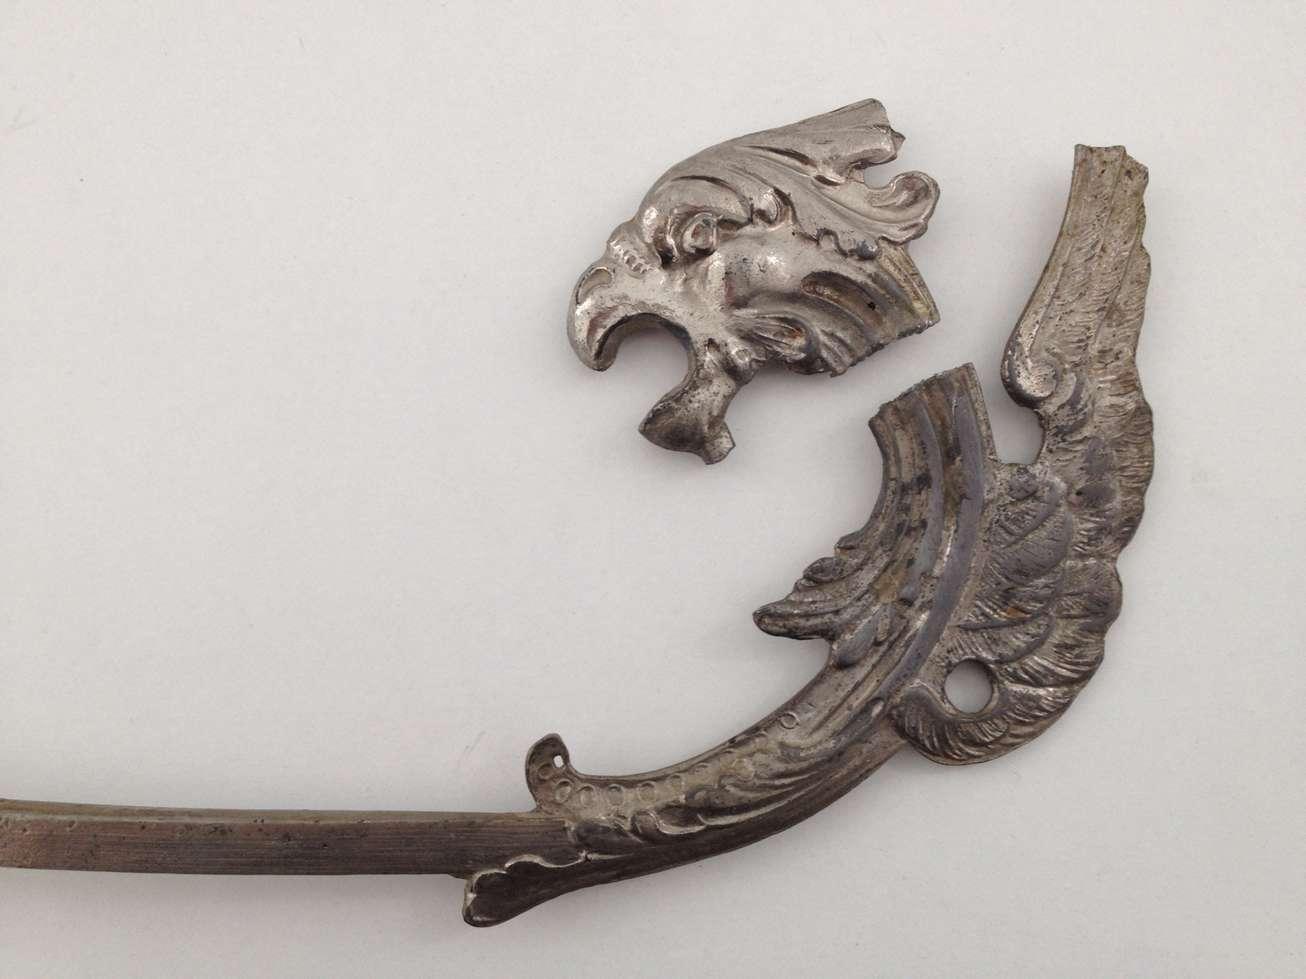 regule-anse-corbeille-verre-cristal-dragon-stylise-art-1900-restauration-collage-restaurarte.jpg